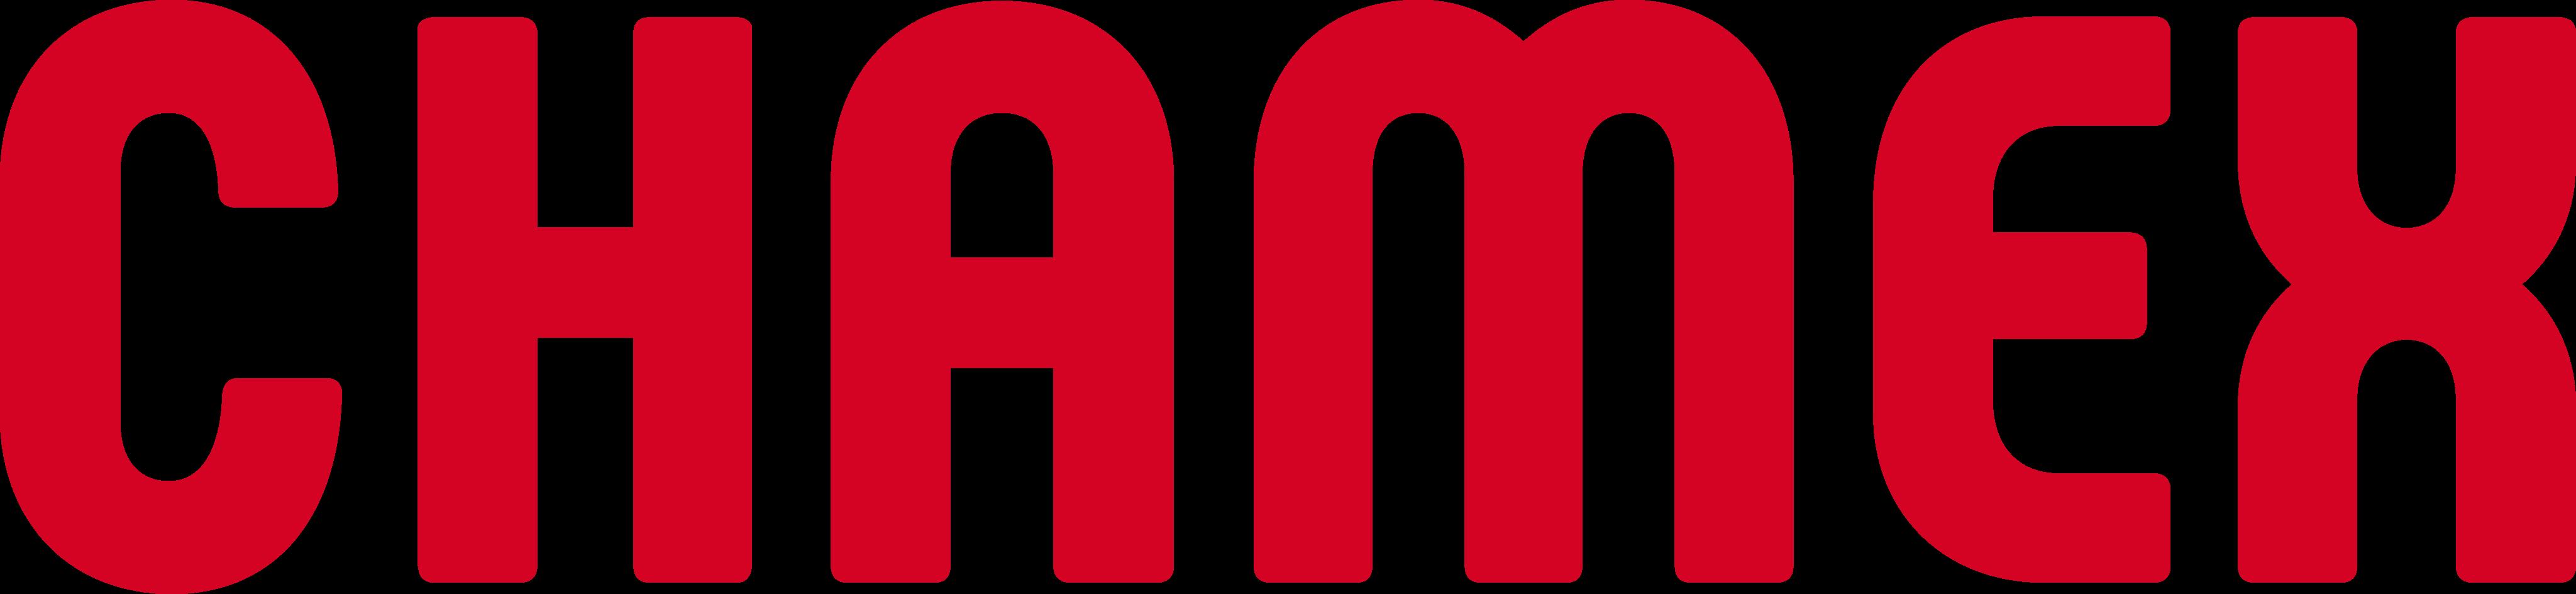 Chamex Logo.